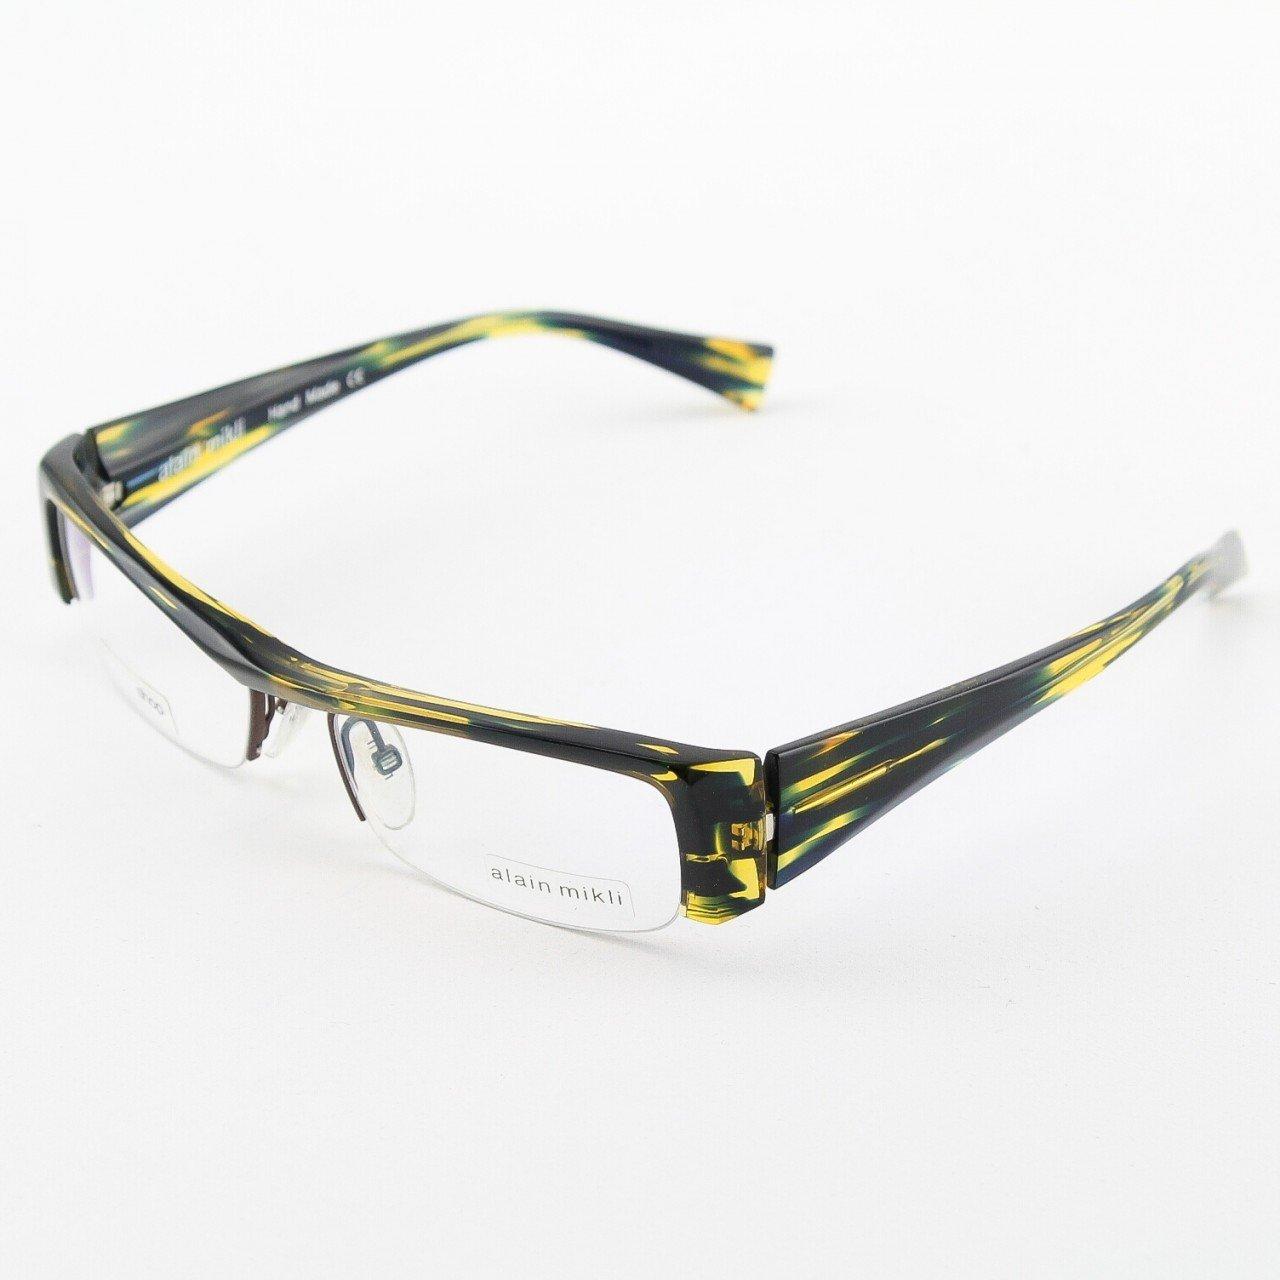 Alain Mikli Eyeglasses AL0795 Col. 18 High Fashion Translucent Black and Yellow with Slanted Bridge